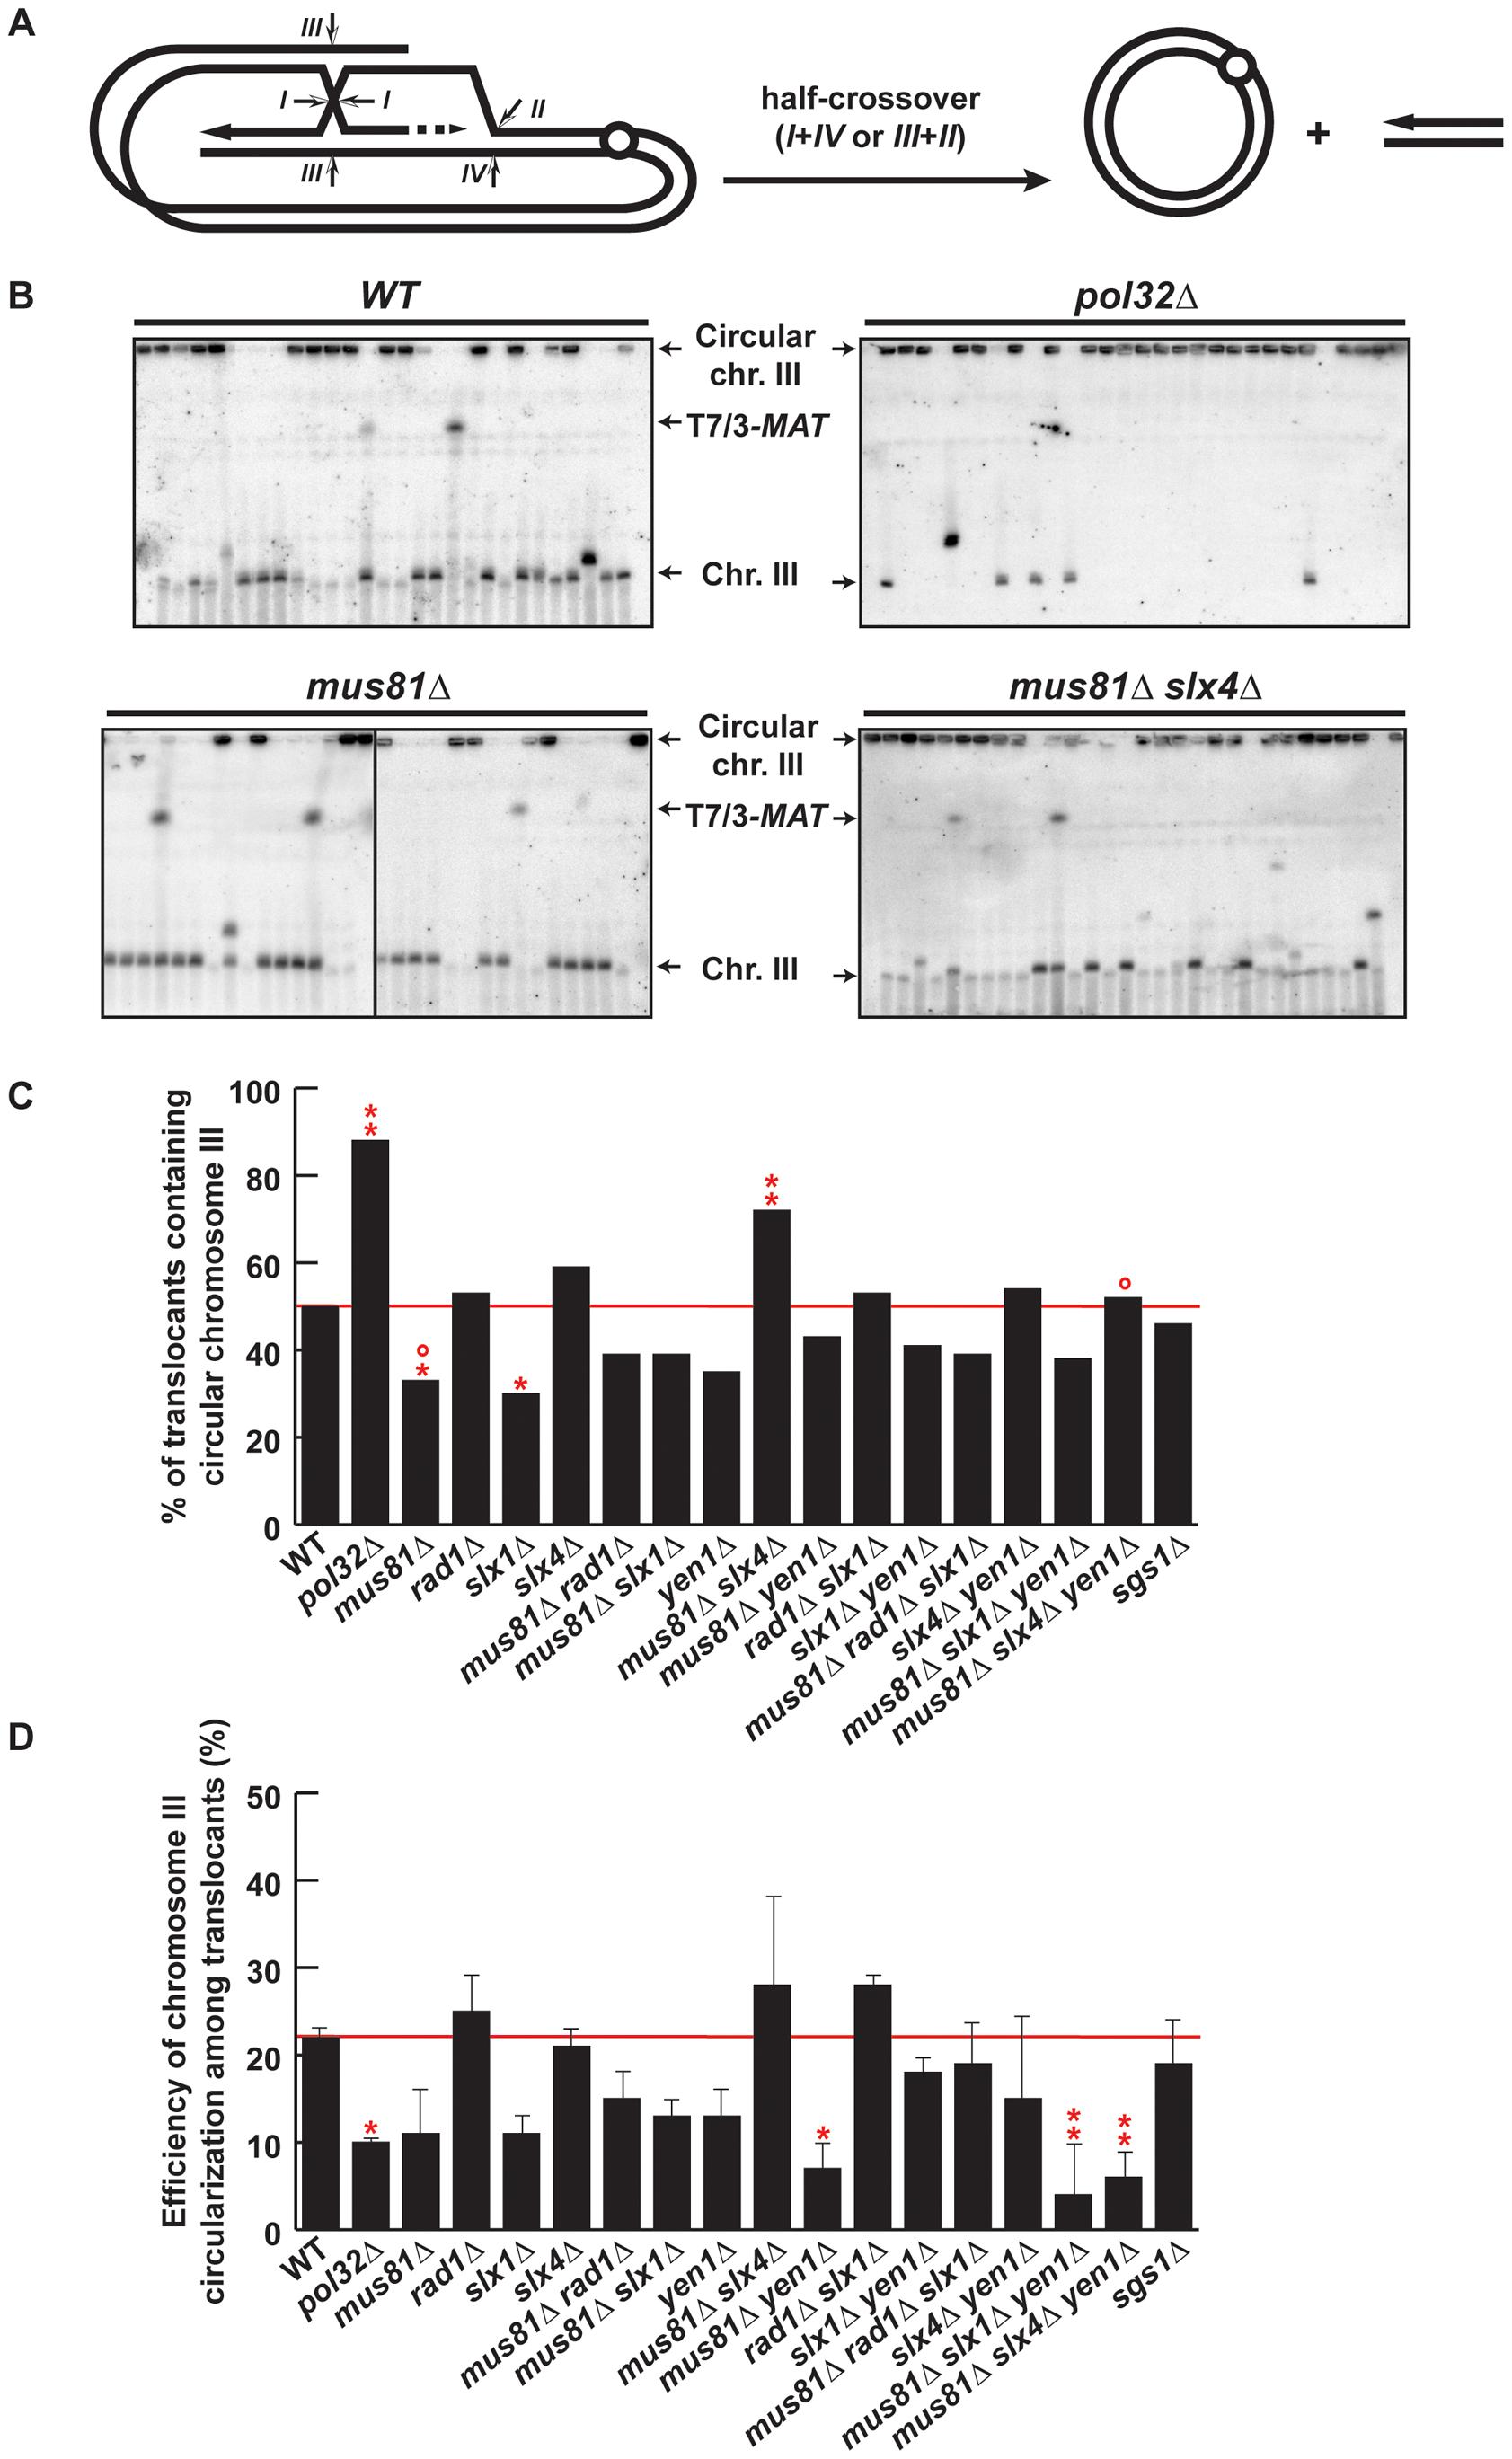 PFGE analysis of chromosome III circularization in SSE mutants.